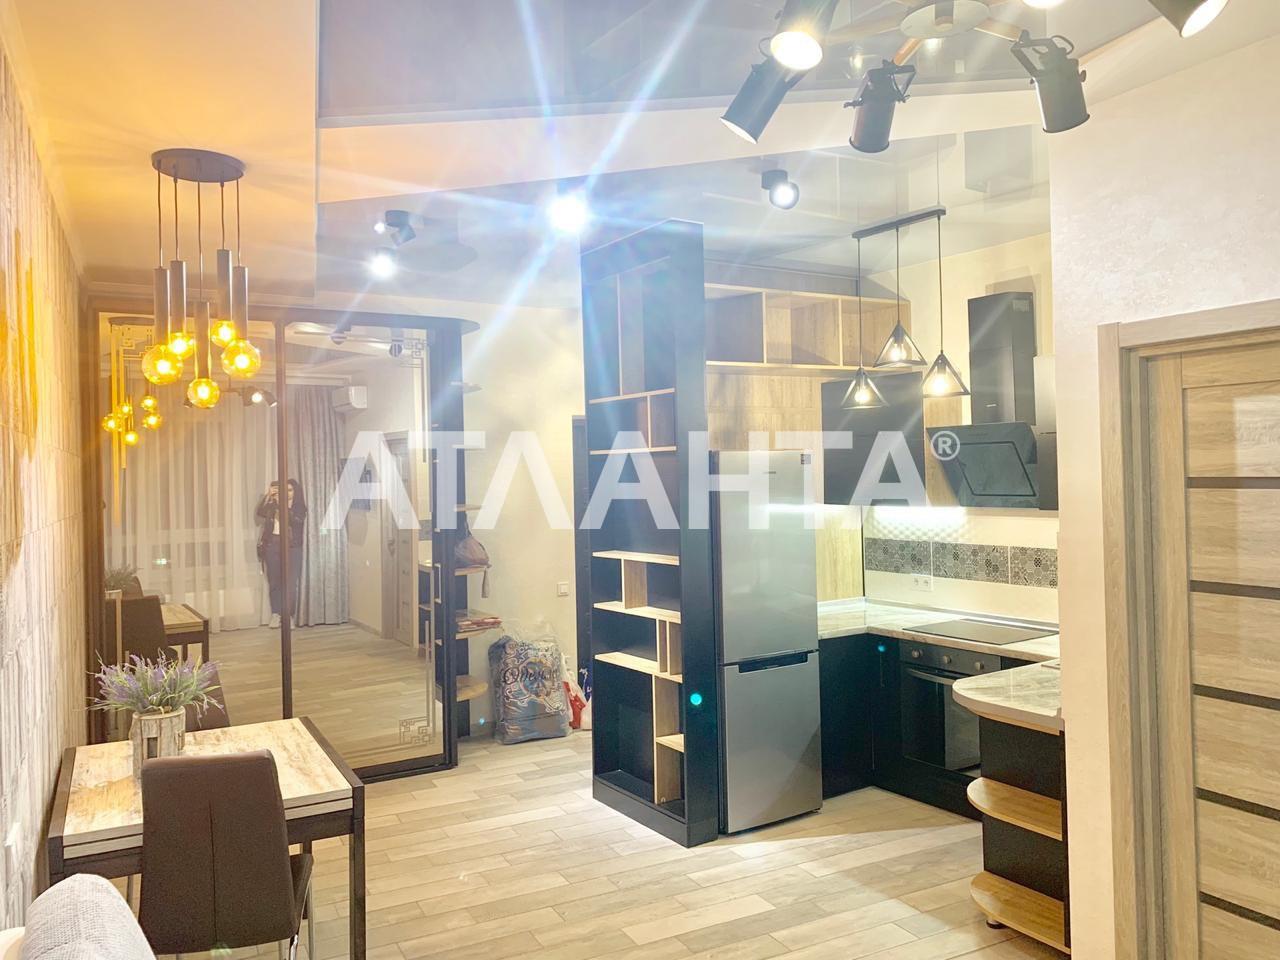 Продается 1-комнатная Квартира на ул. Генуэзская — 68 000 у.е. (фото №3)